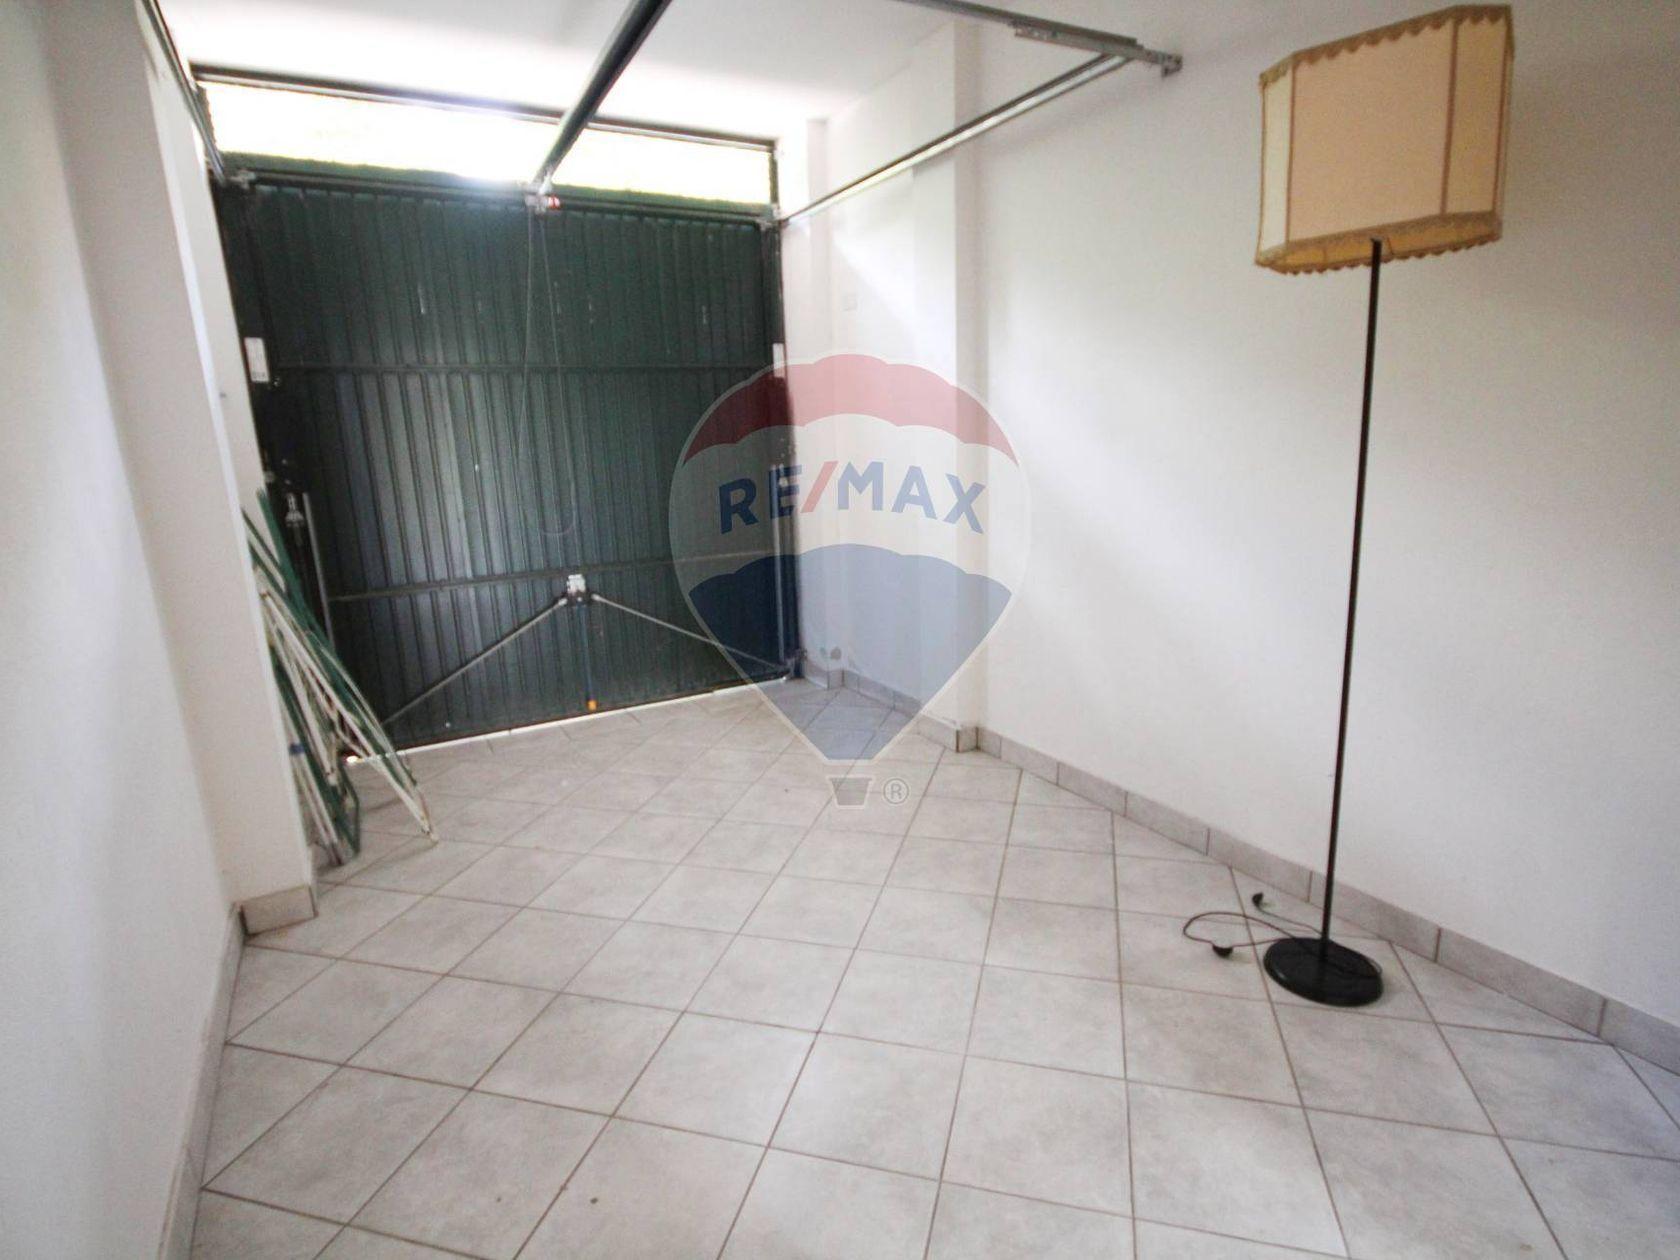 Appartamento Cantarana, Cona, VE Vendita - Foto 14